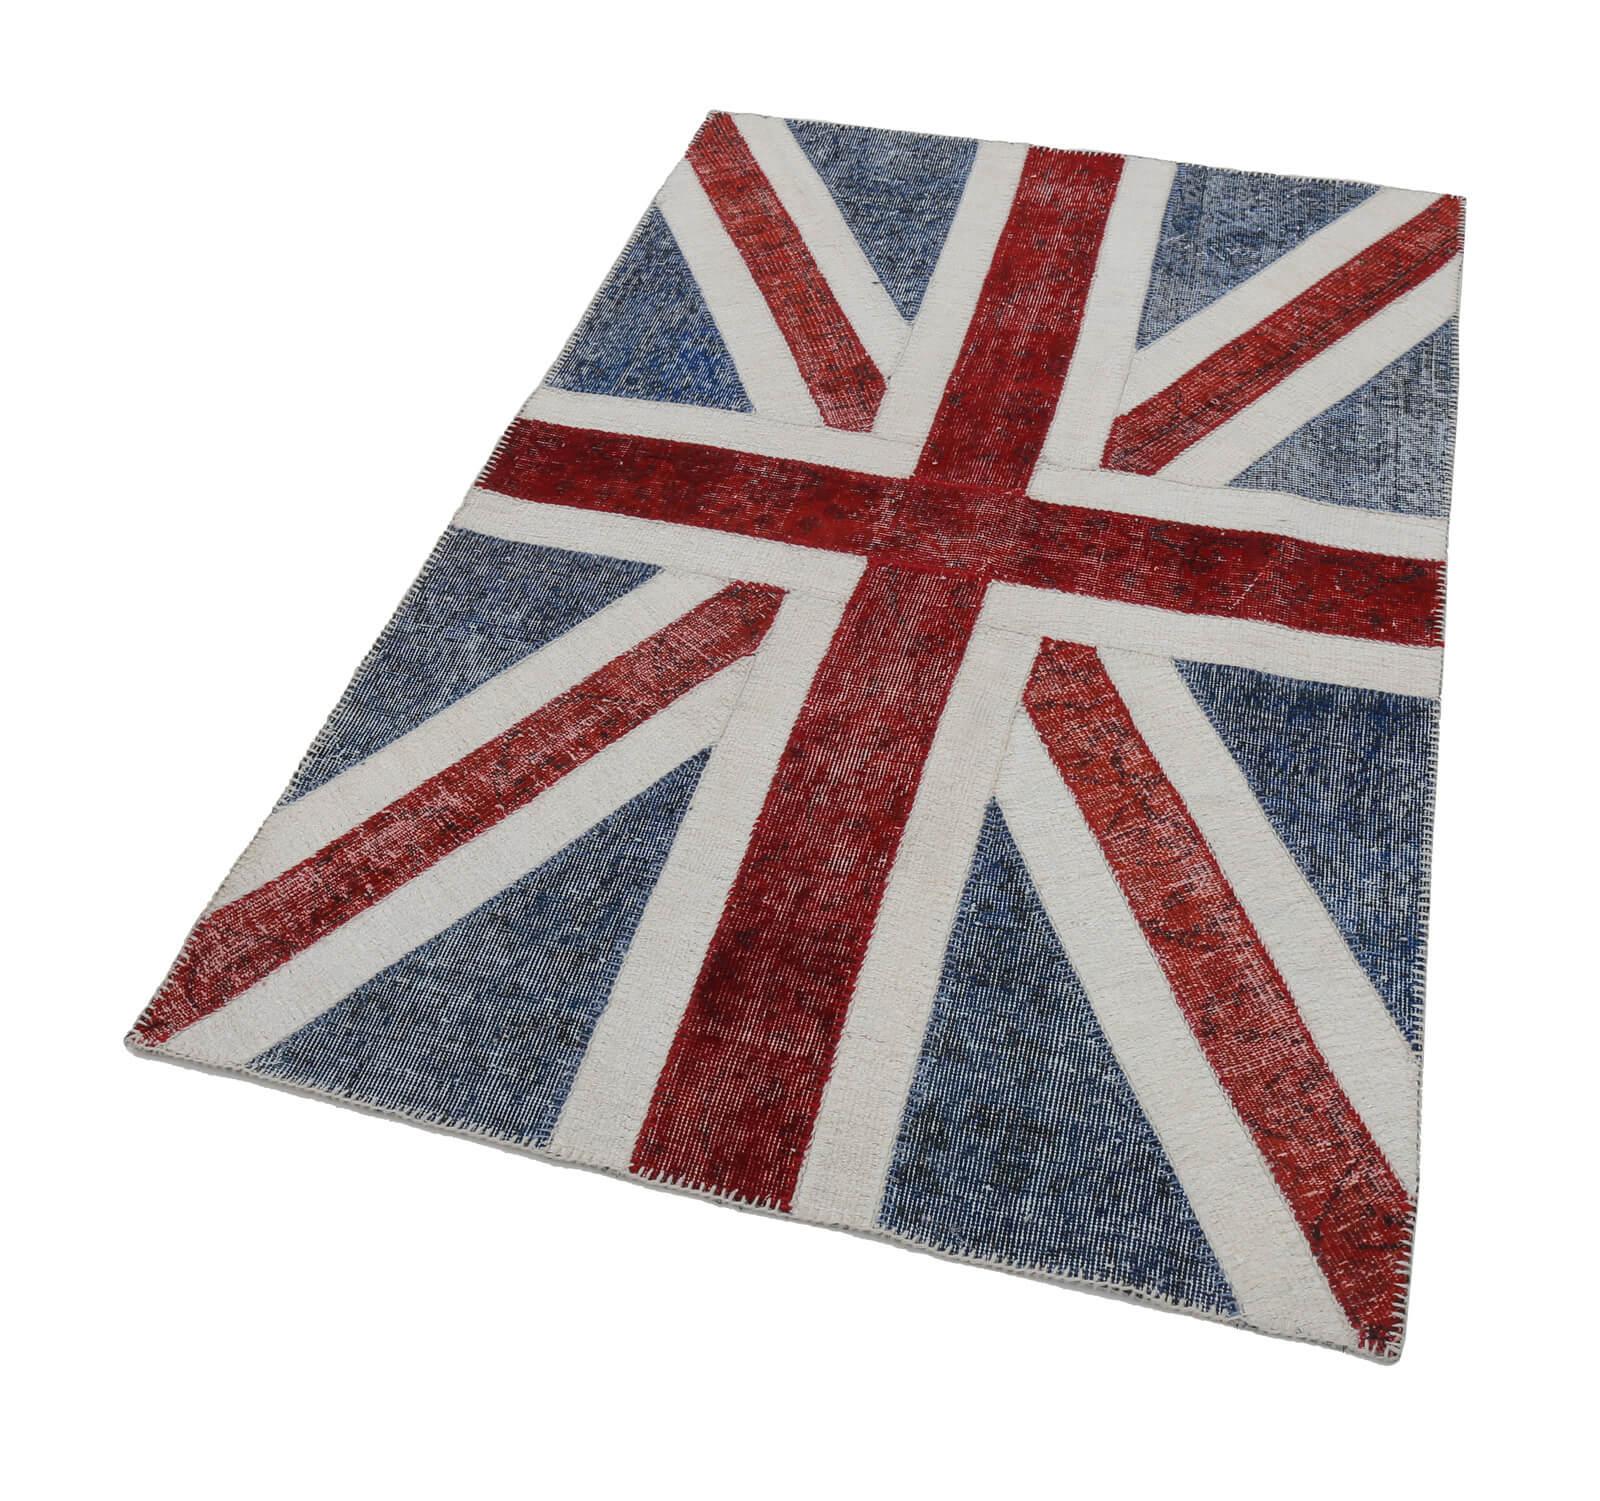 121x182 Cm British Handmade Flag Patchwork Rug-4x6 Ft